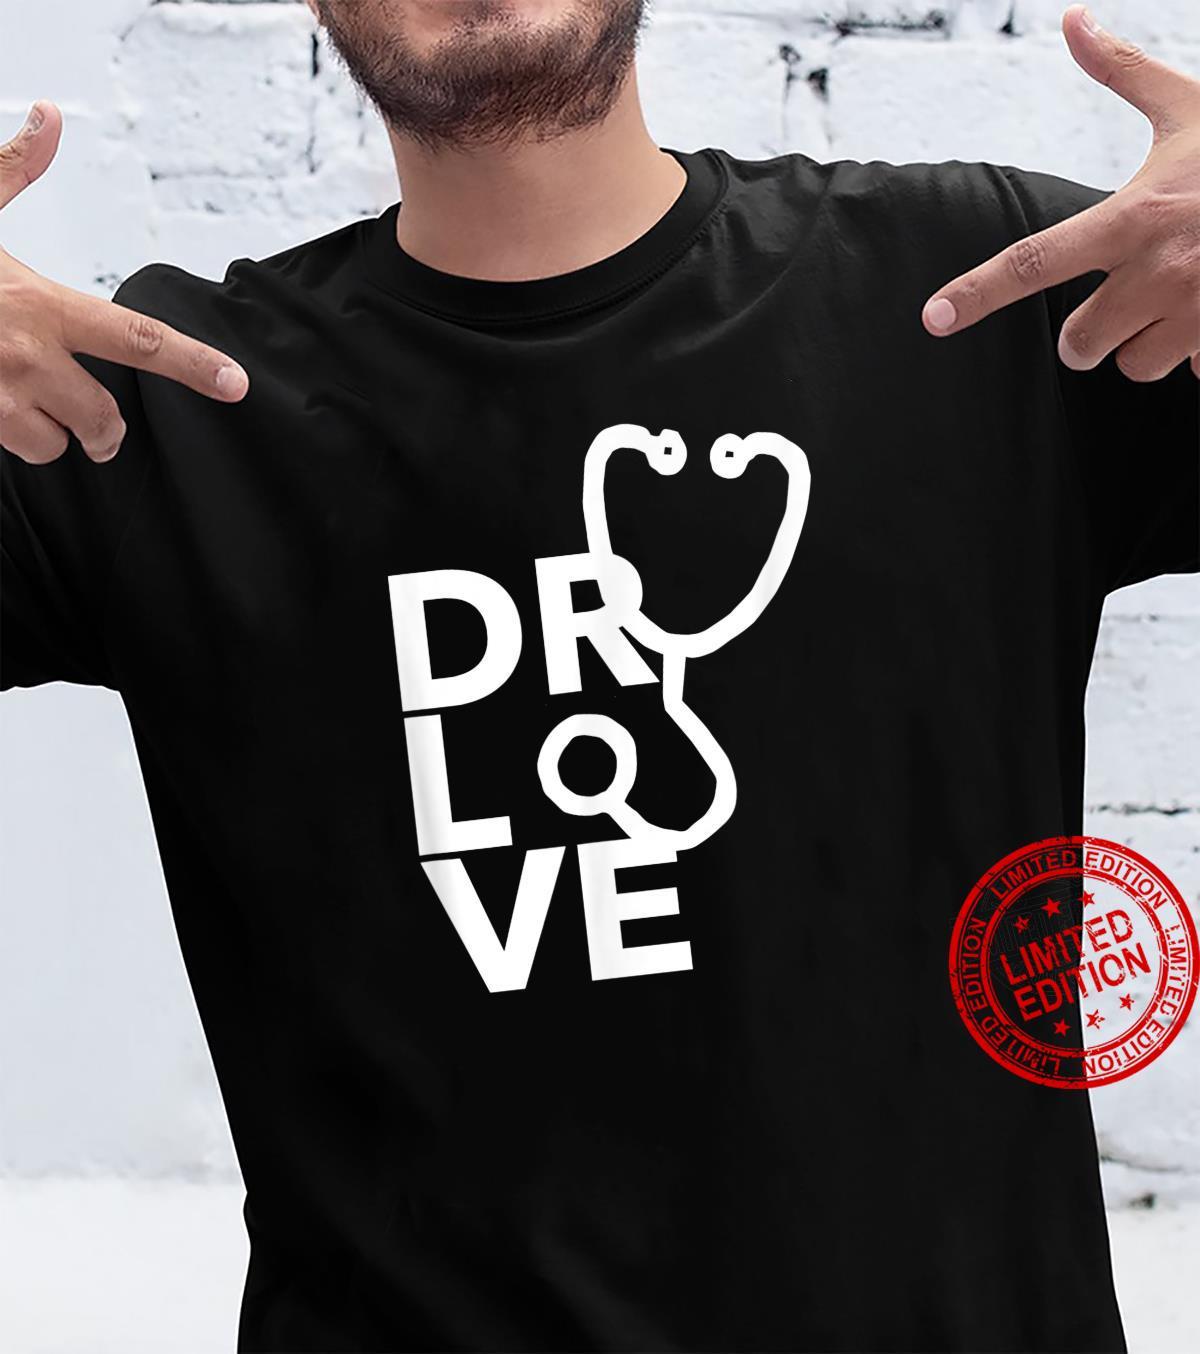 DR LOVE for medical doctor birthday med student Shirt